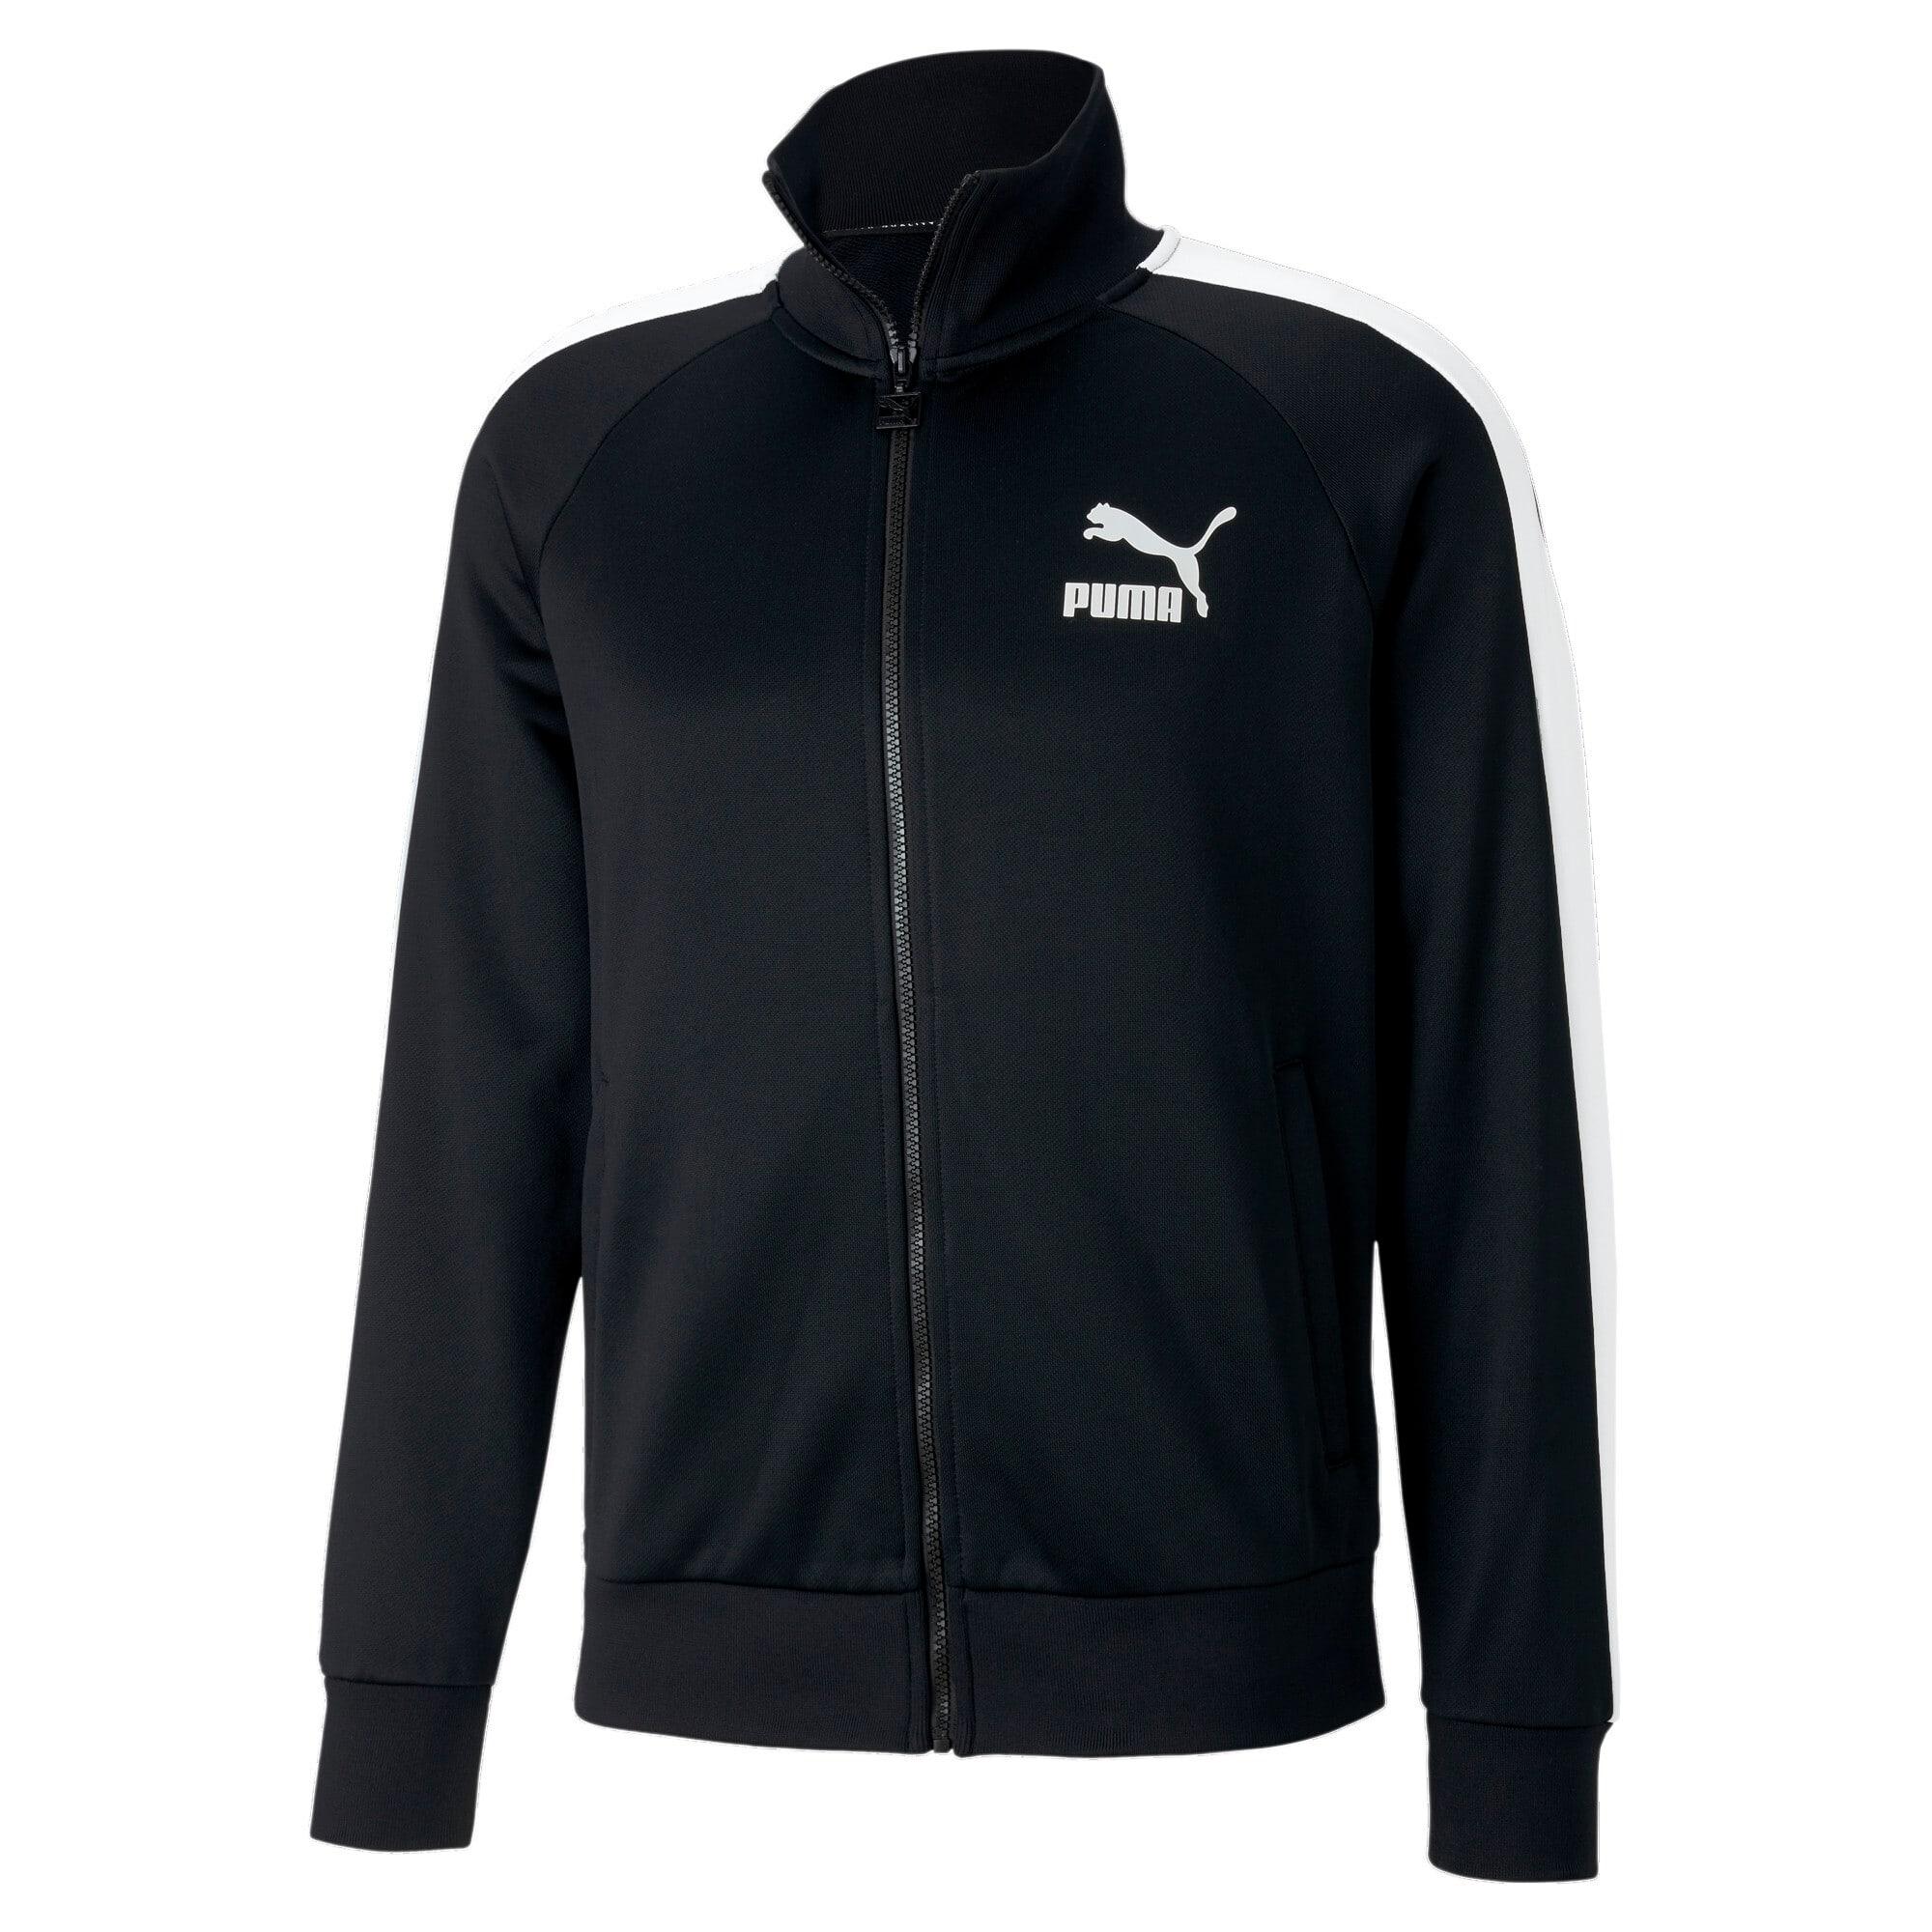 Thumbnail 4 of Iconic T7 Men's Track Jacket, Puma Black, medium